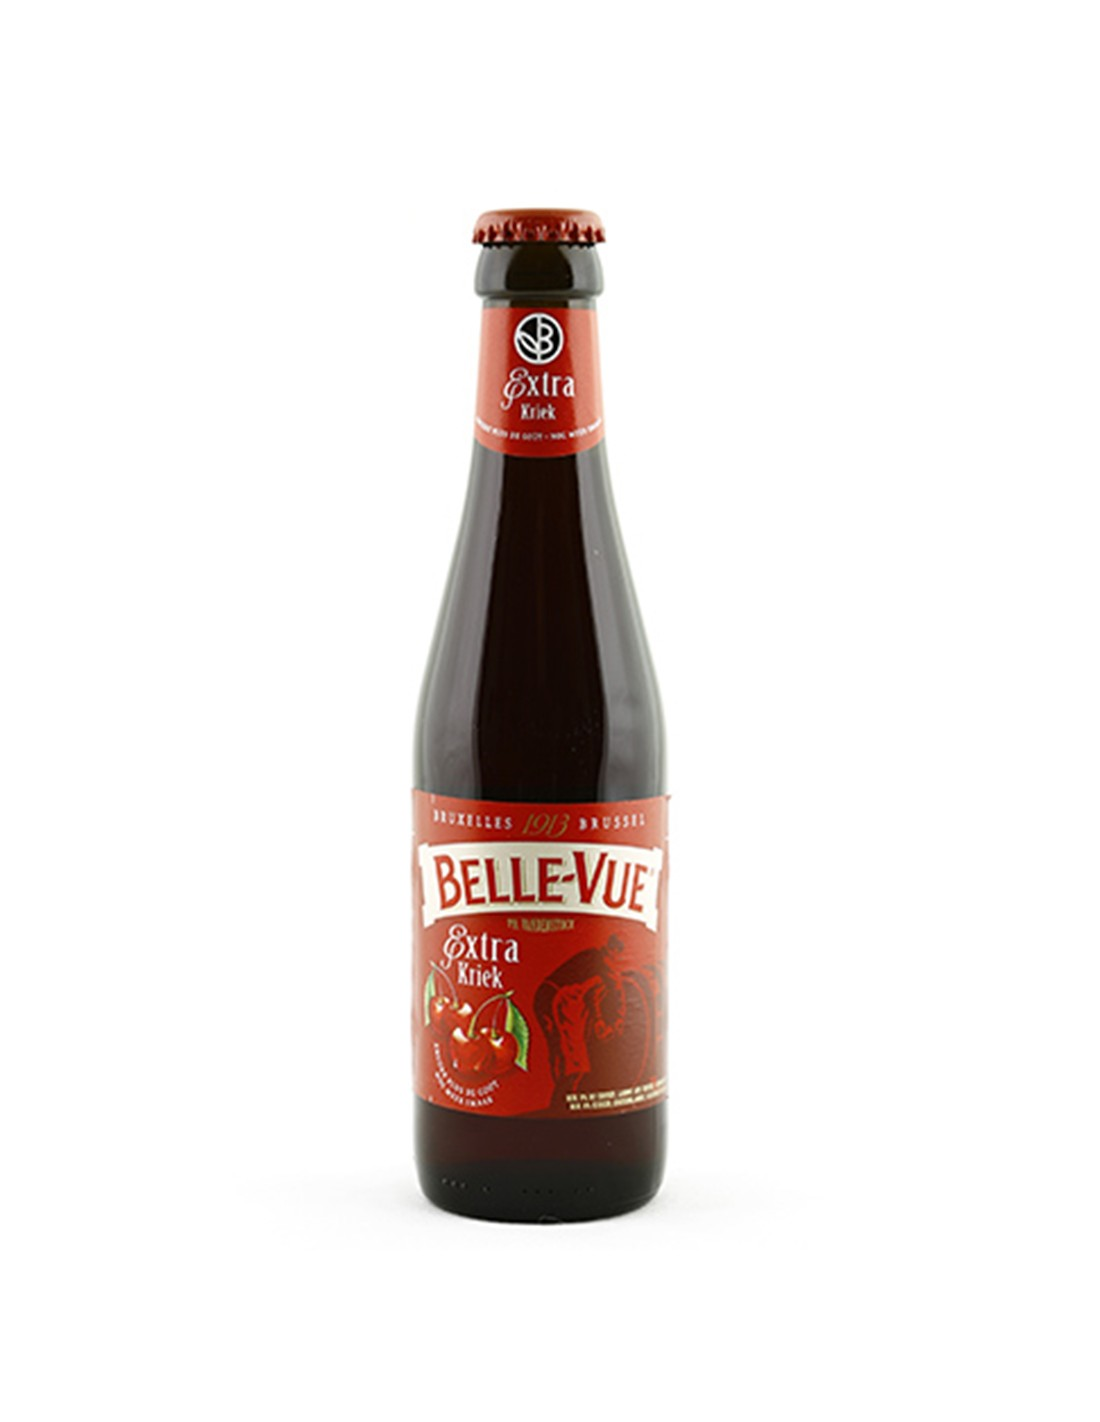 Bere Lambic Belle Vue Kriek Extra, 4.1%, 0.25L, Belgia